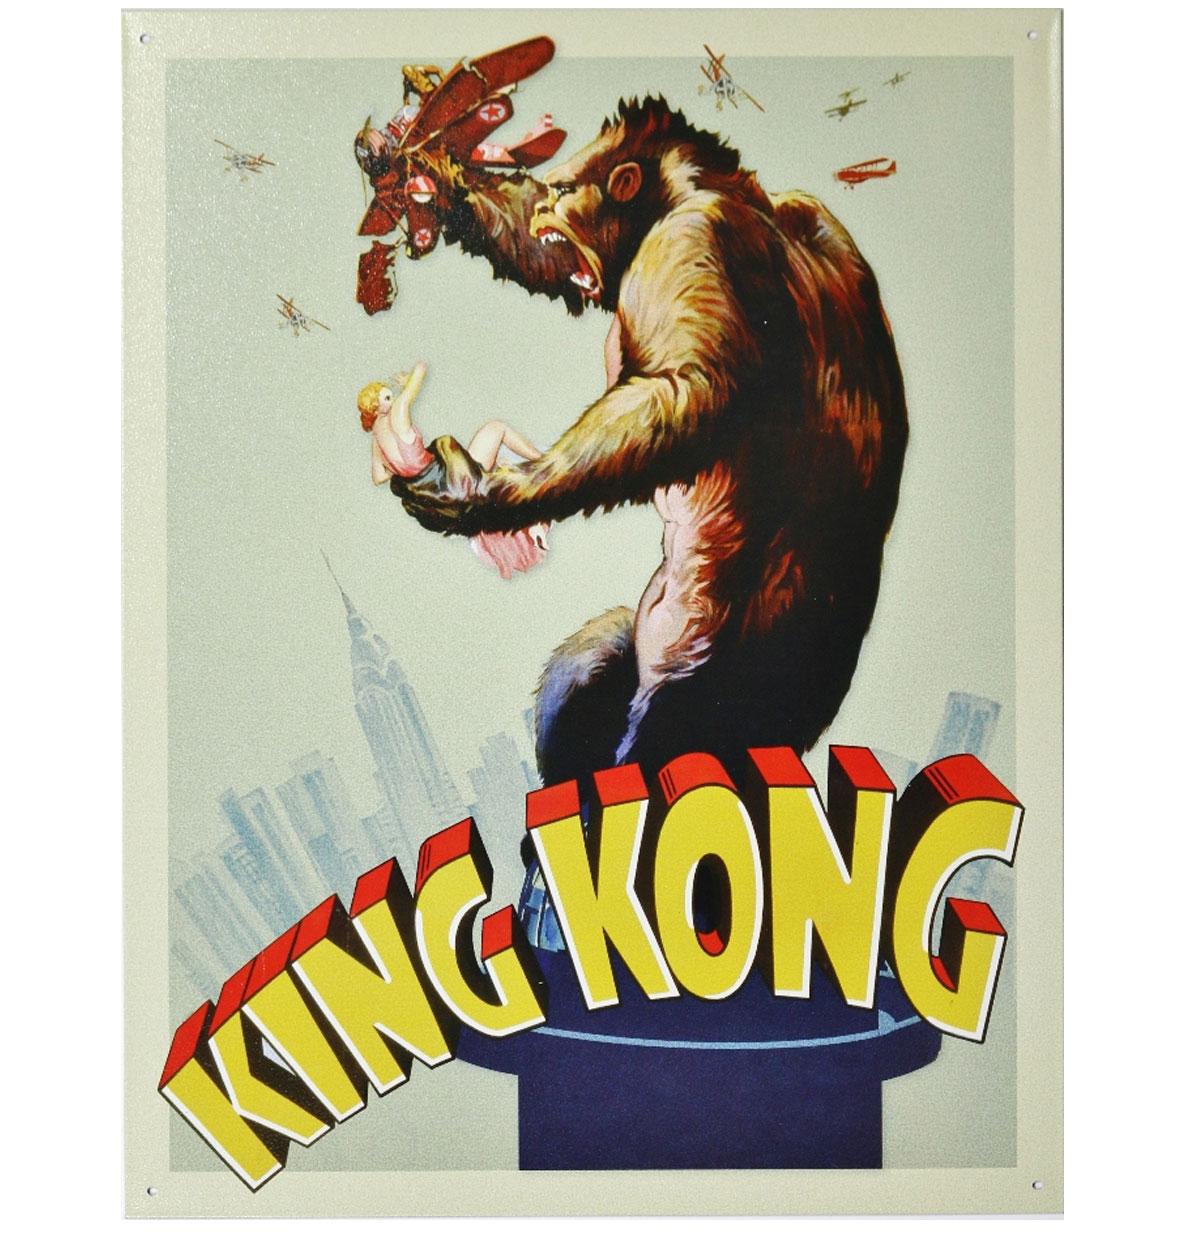 King Kong Metalen Poster